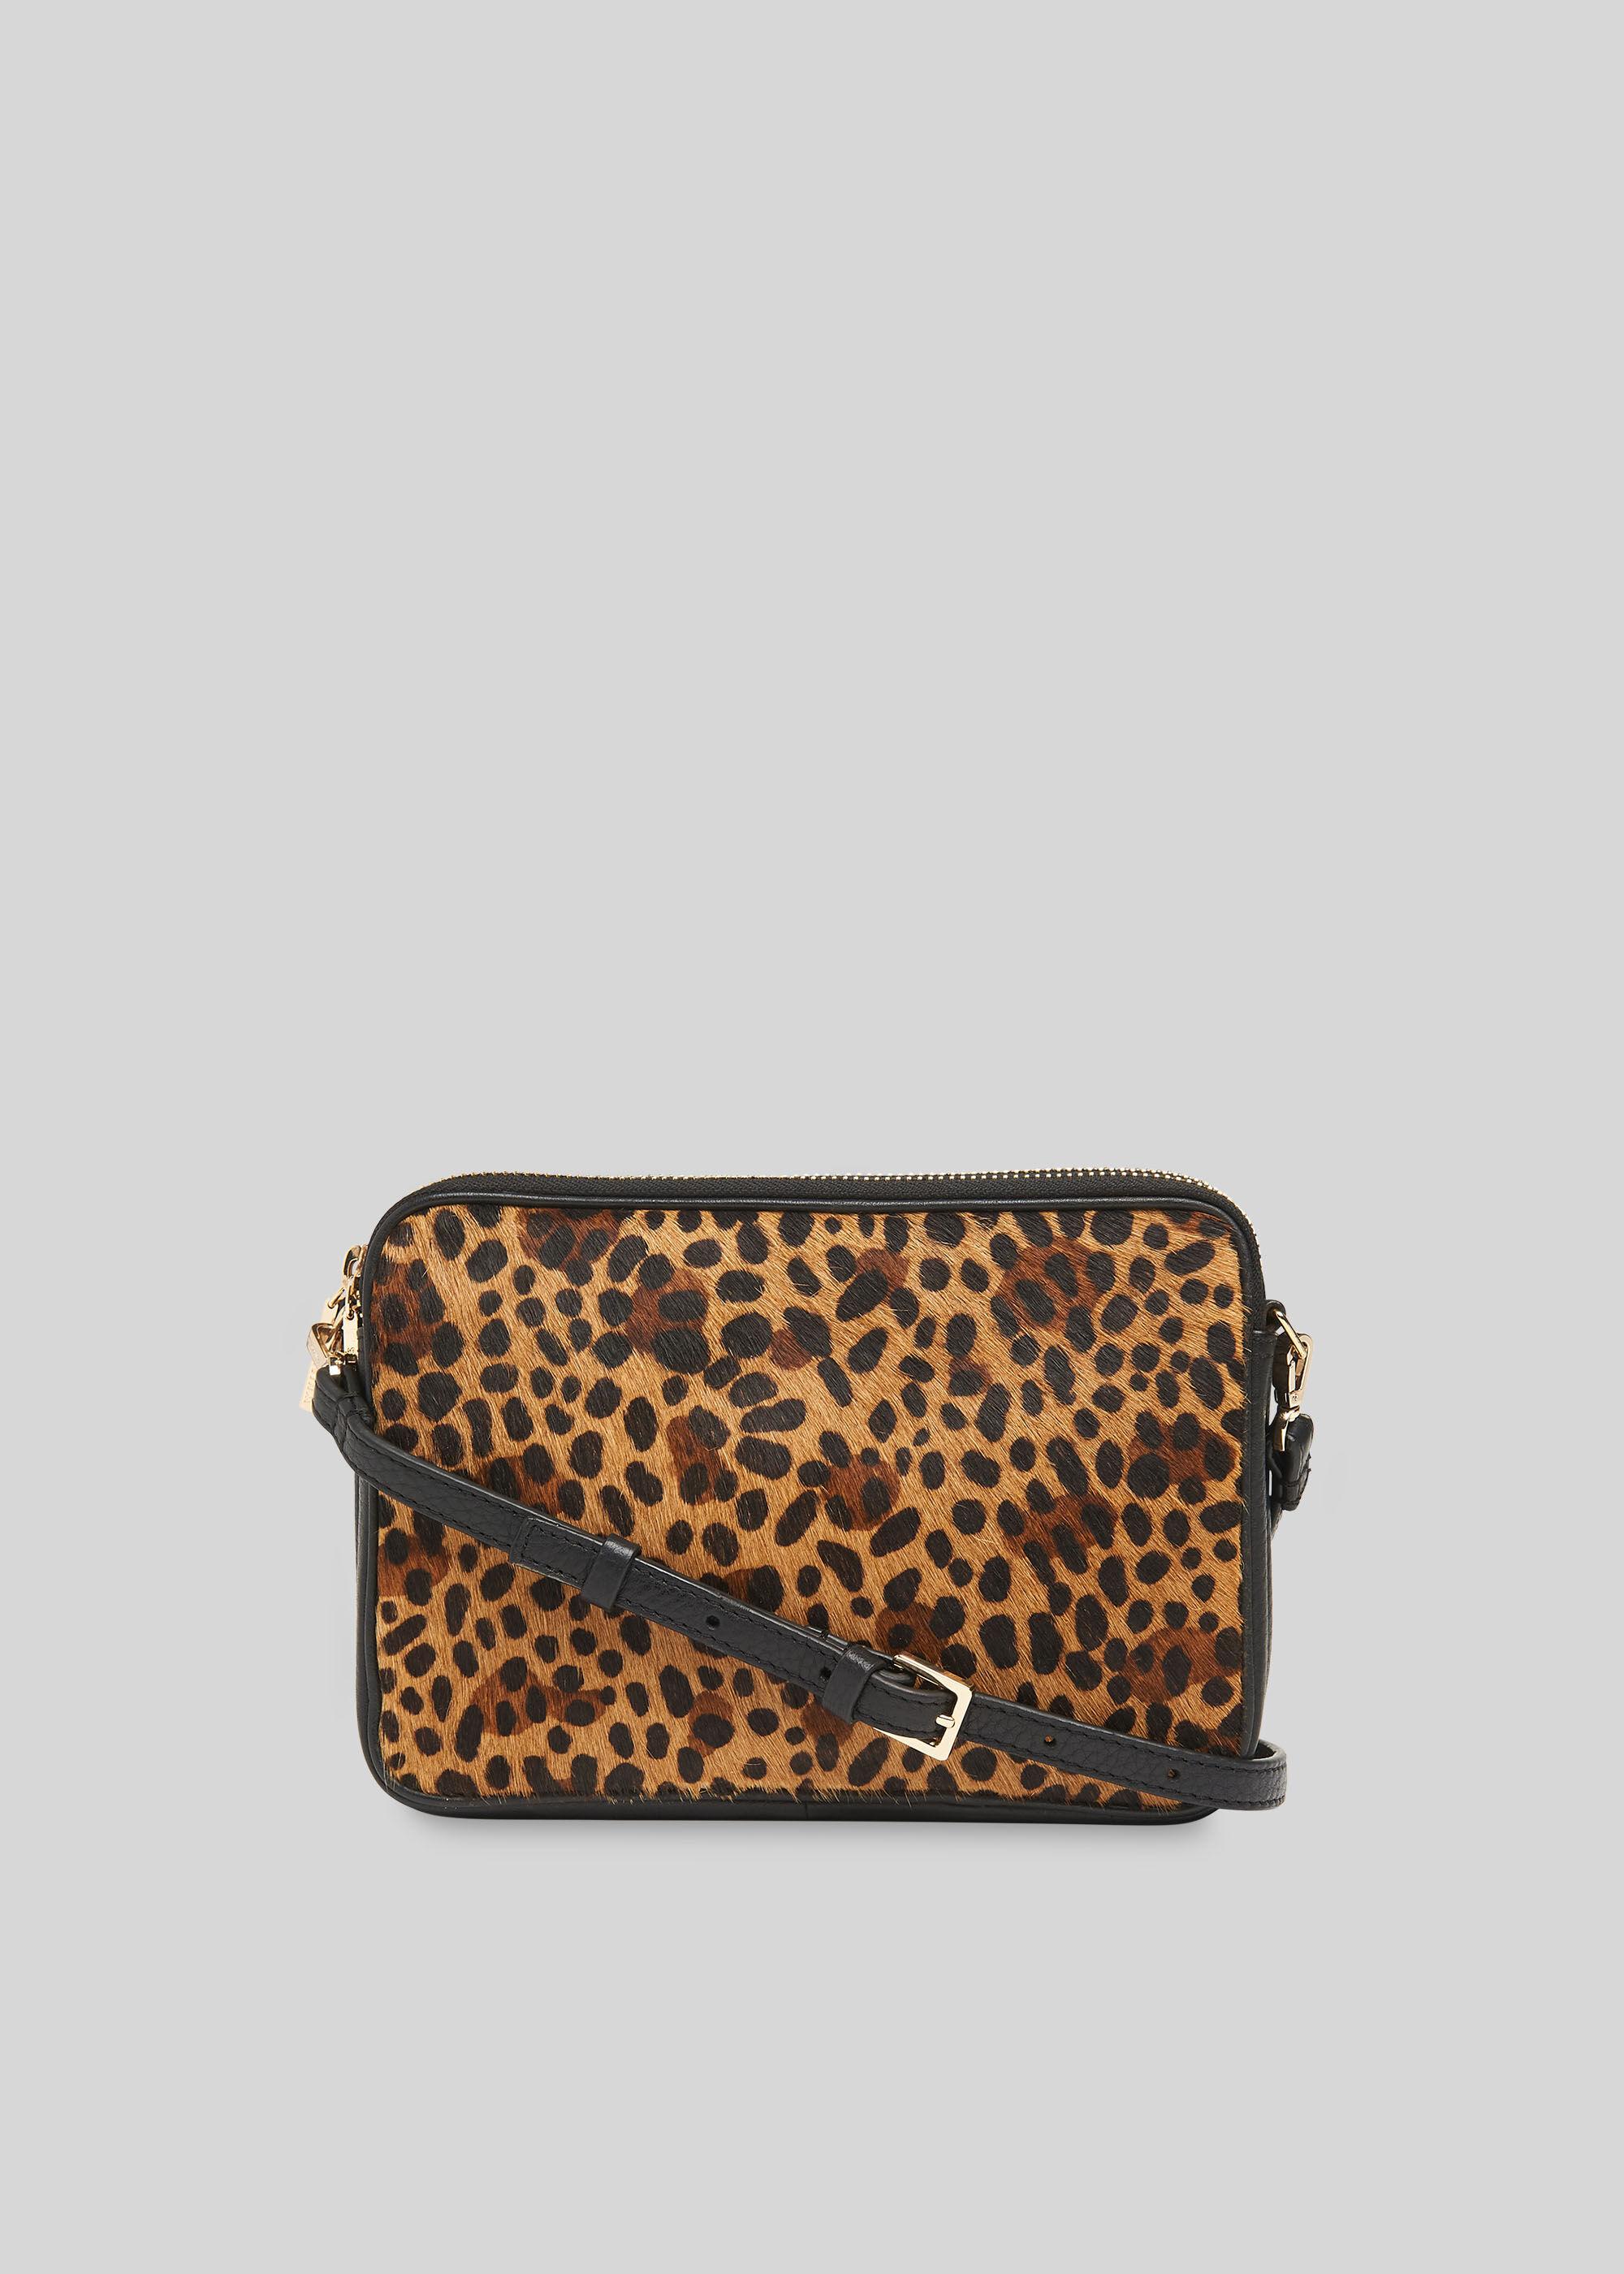 Whistles Women Cami Crossbody Bag